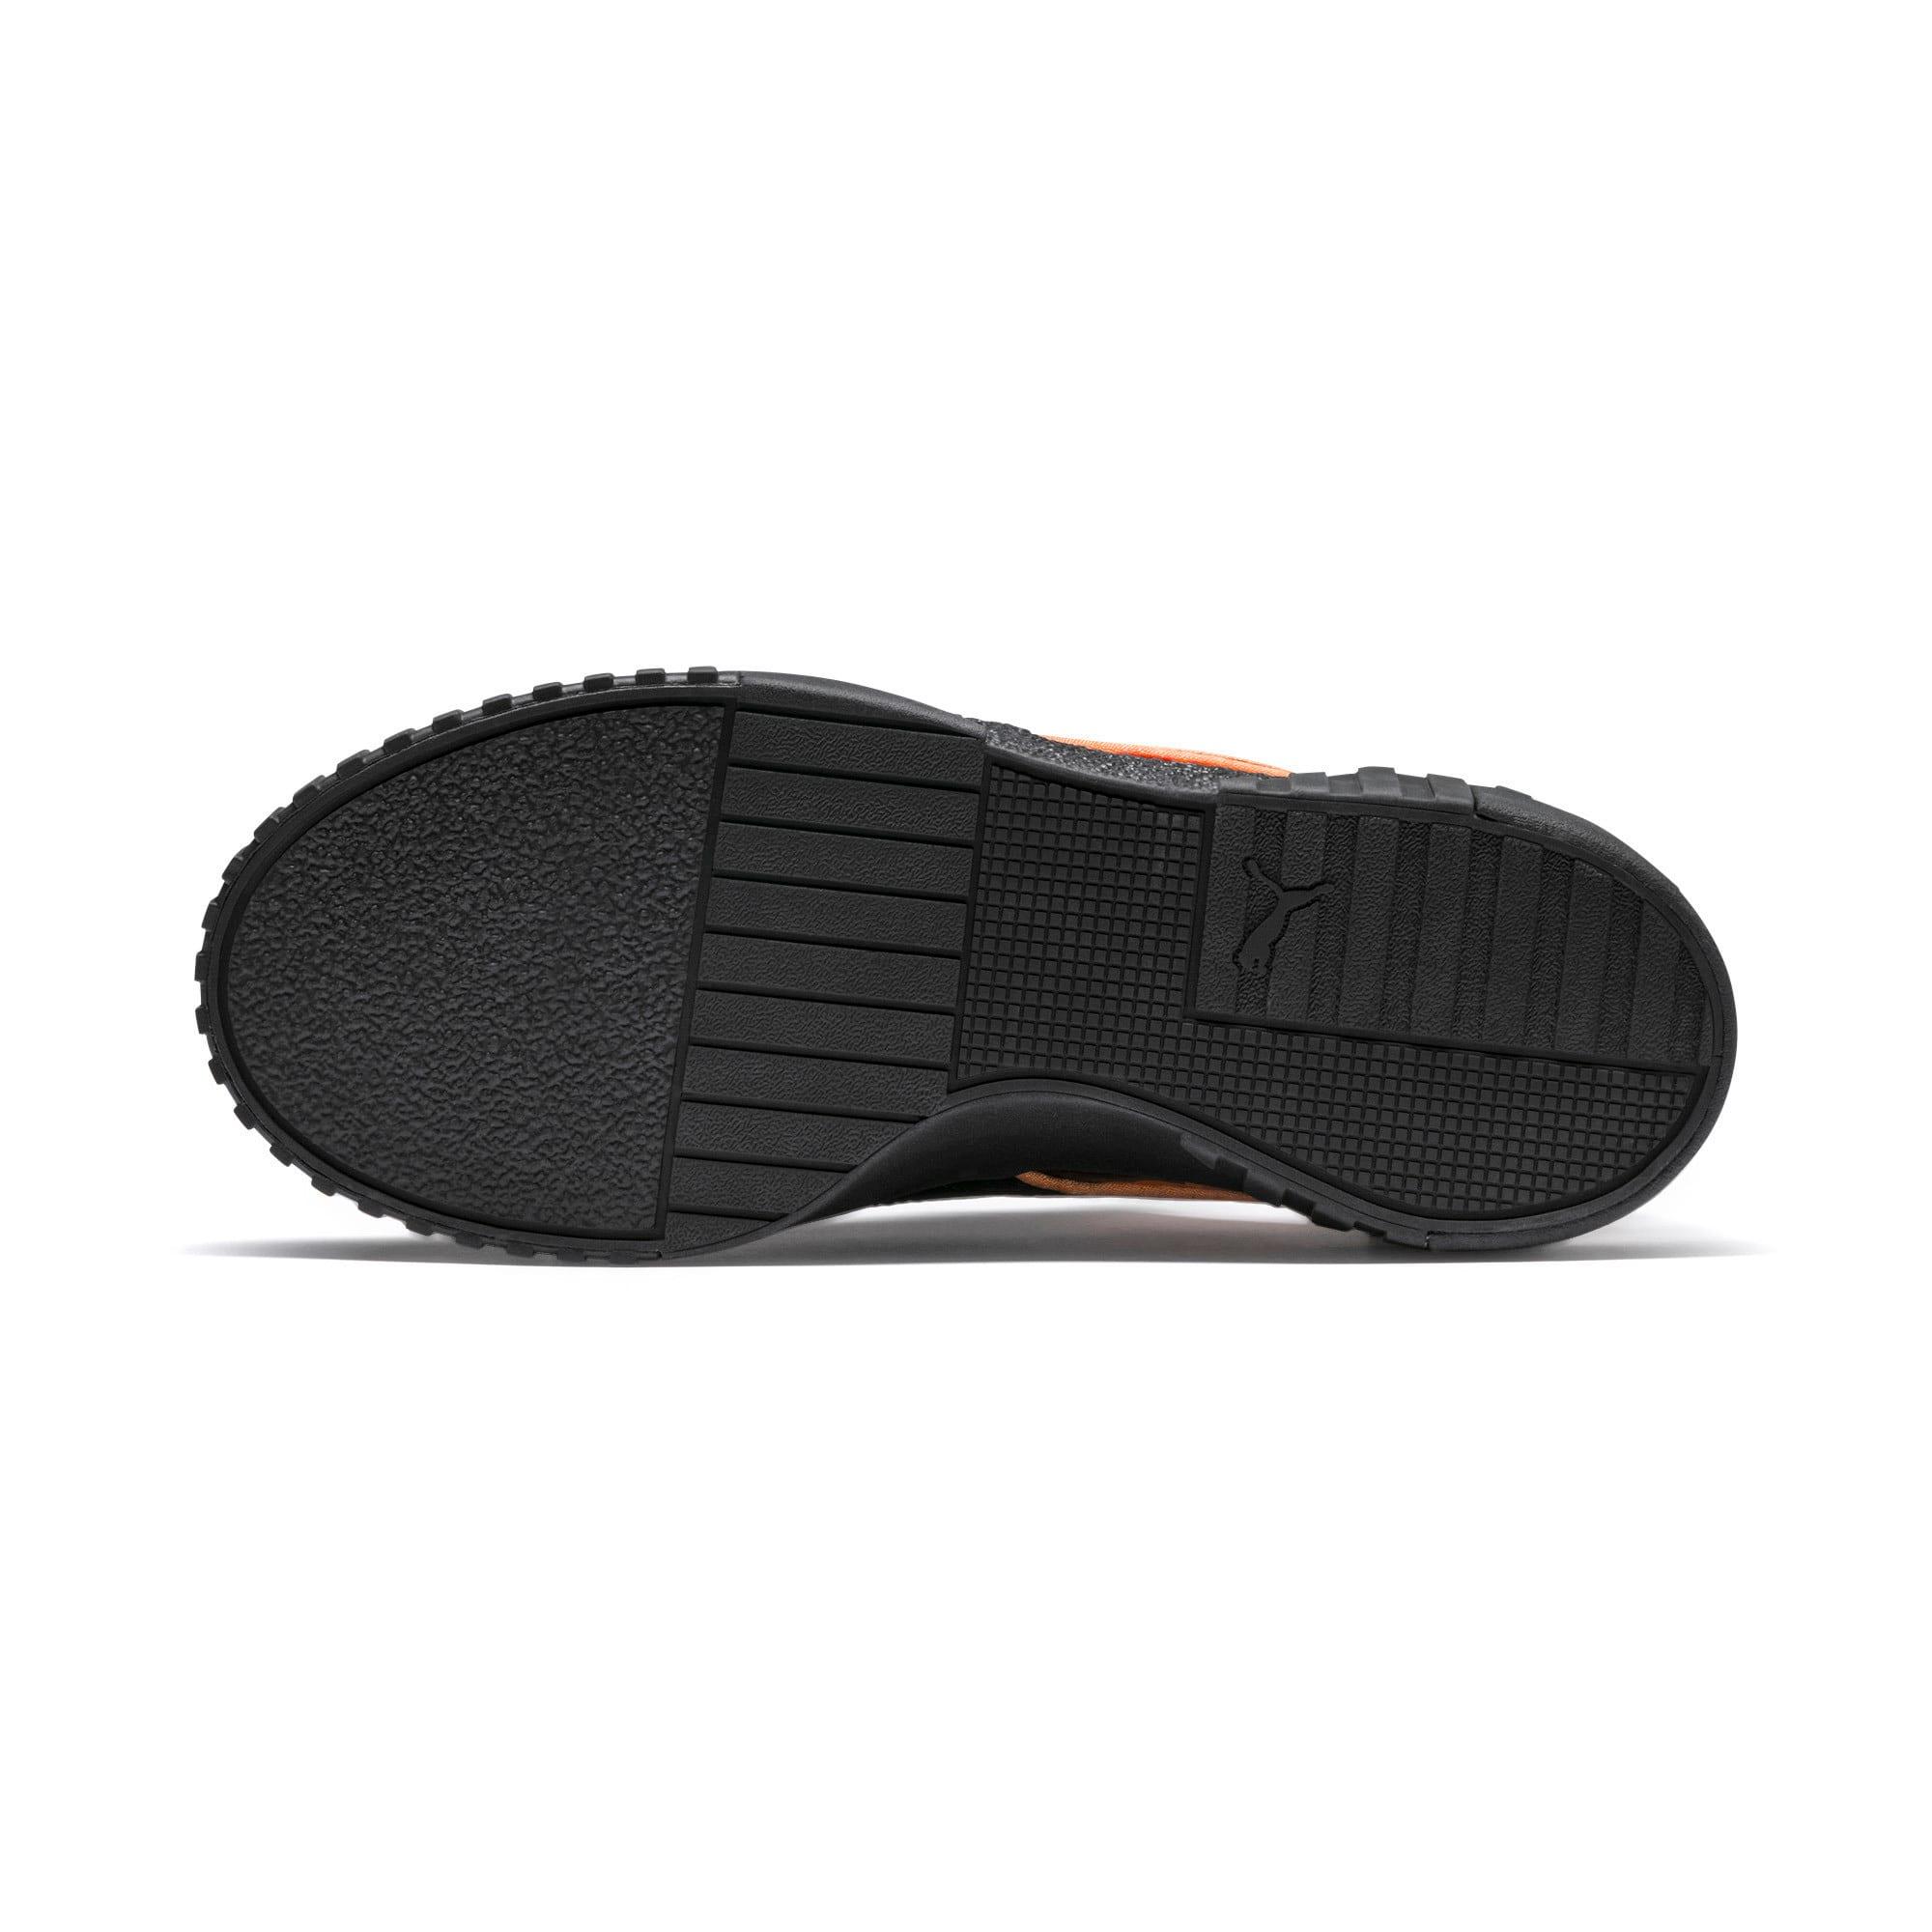 Thumbnail 5 of PUMA x SUE TSAI Cali 'Peonies Camo' Women's Sneakers, Puma Black-Puma Black, medium